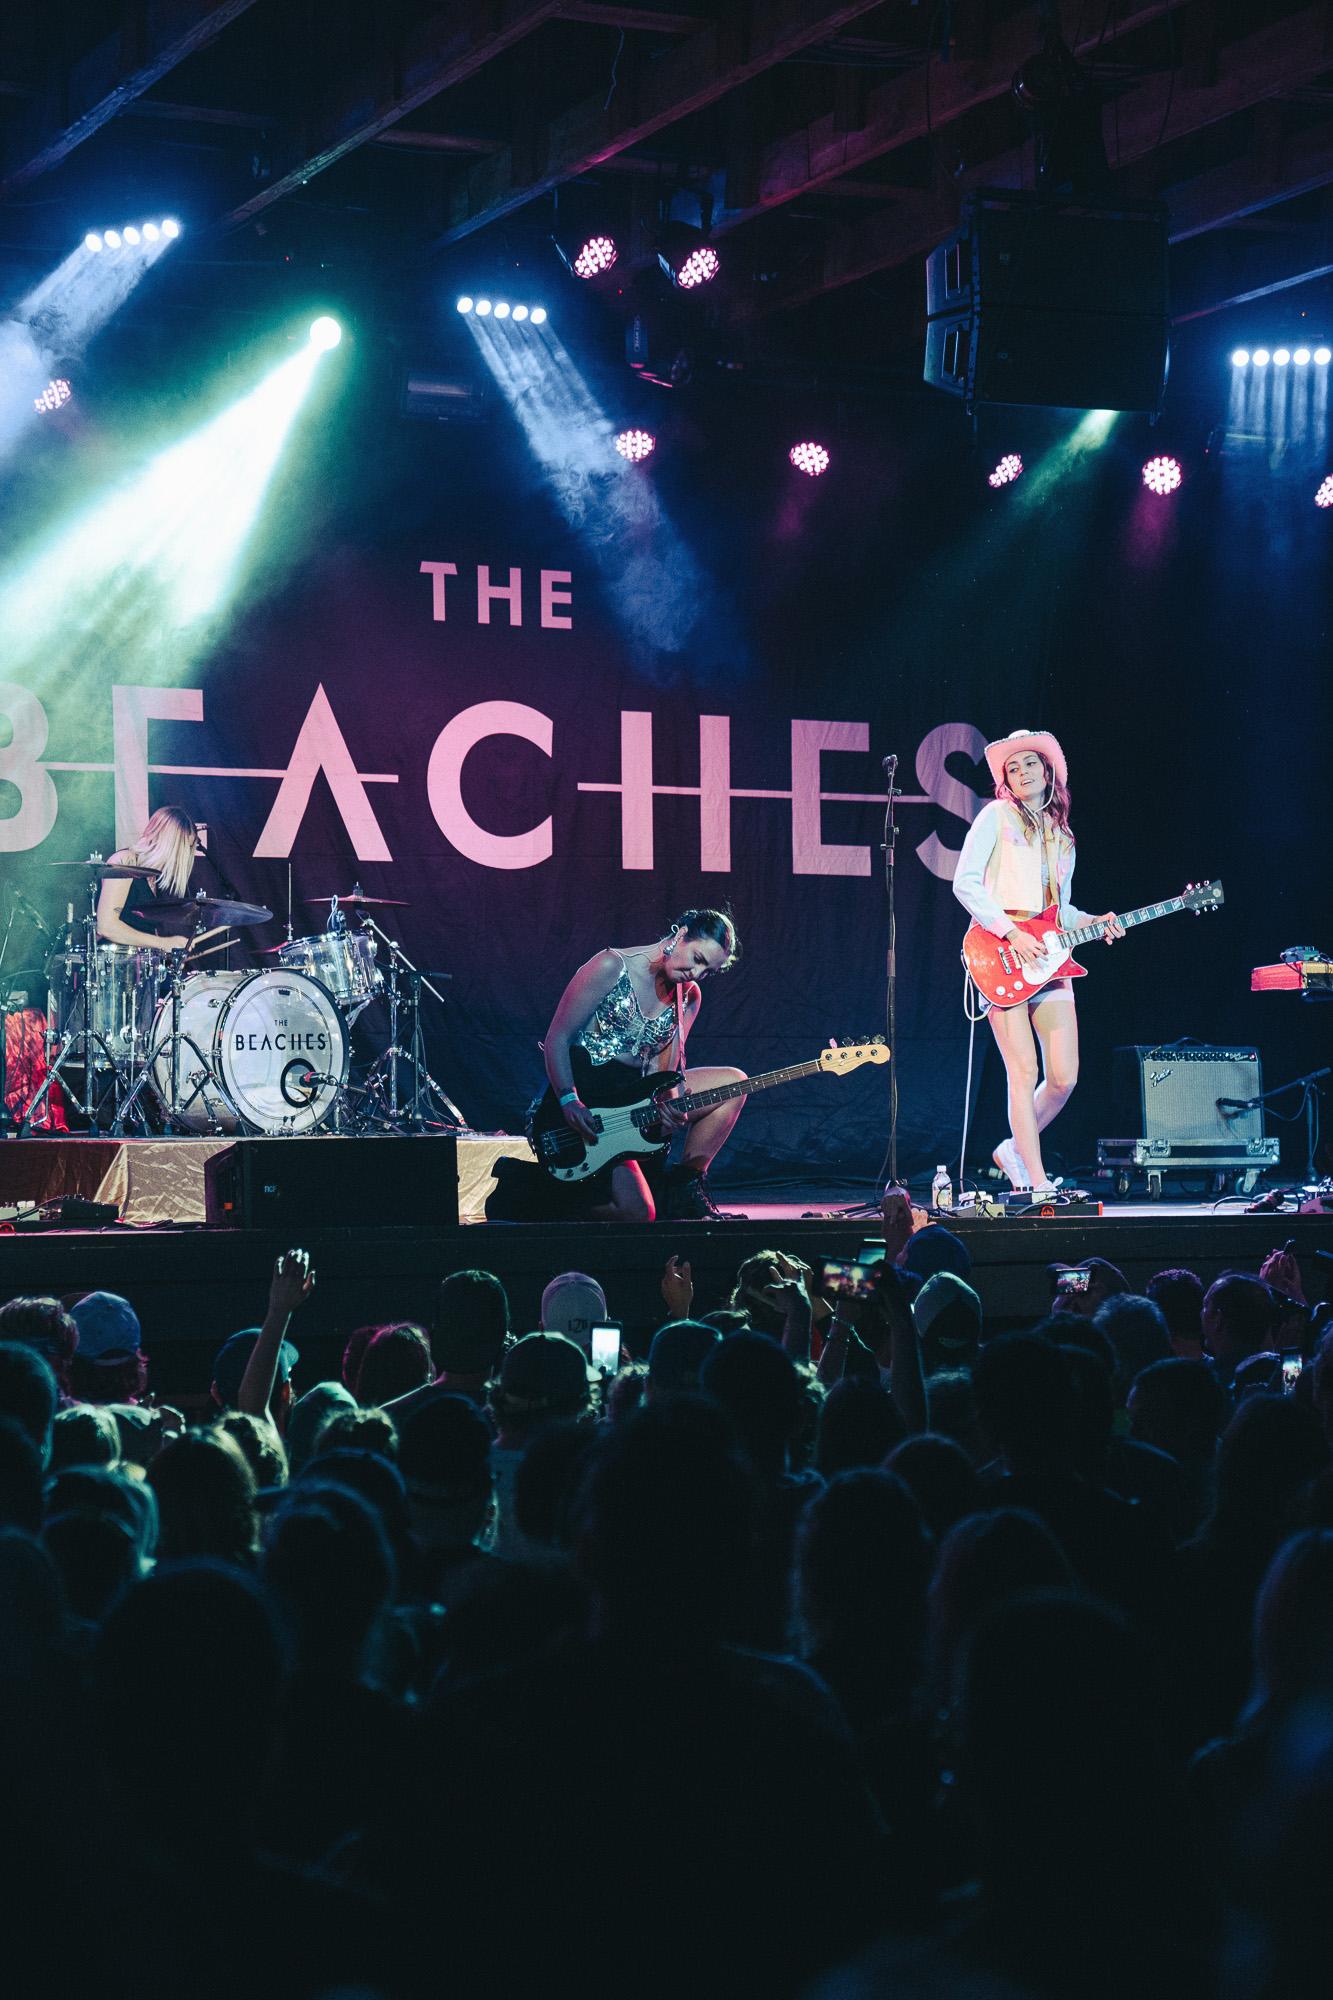 The_Beaches_Bala_1.jpg